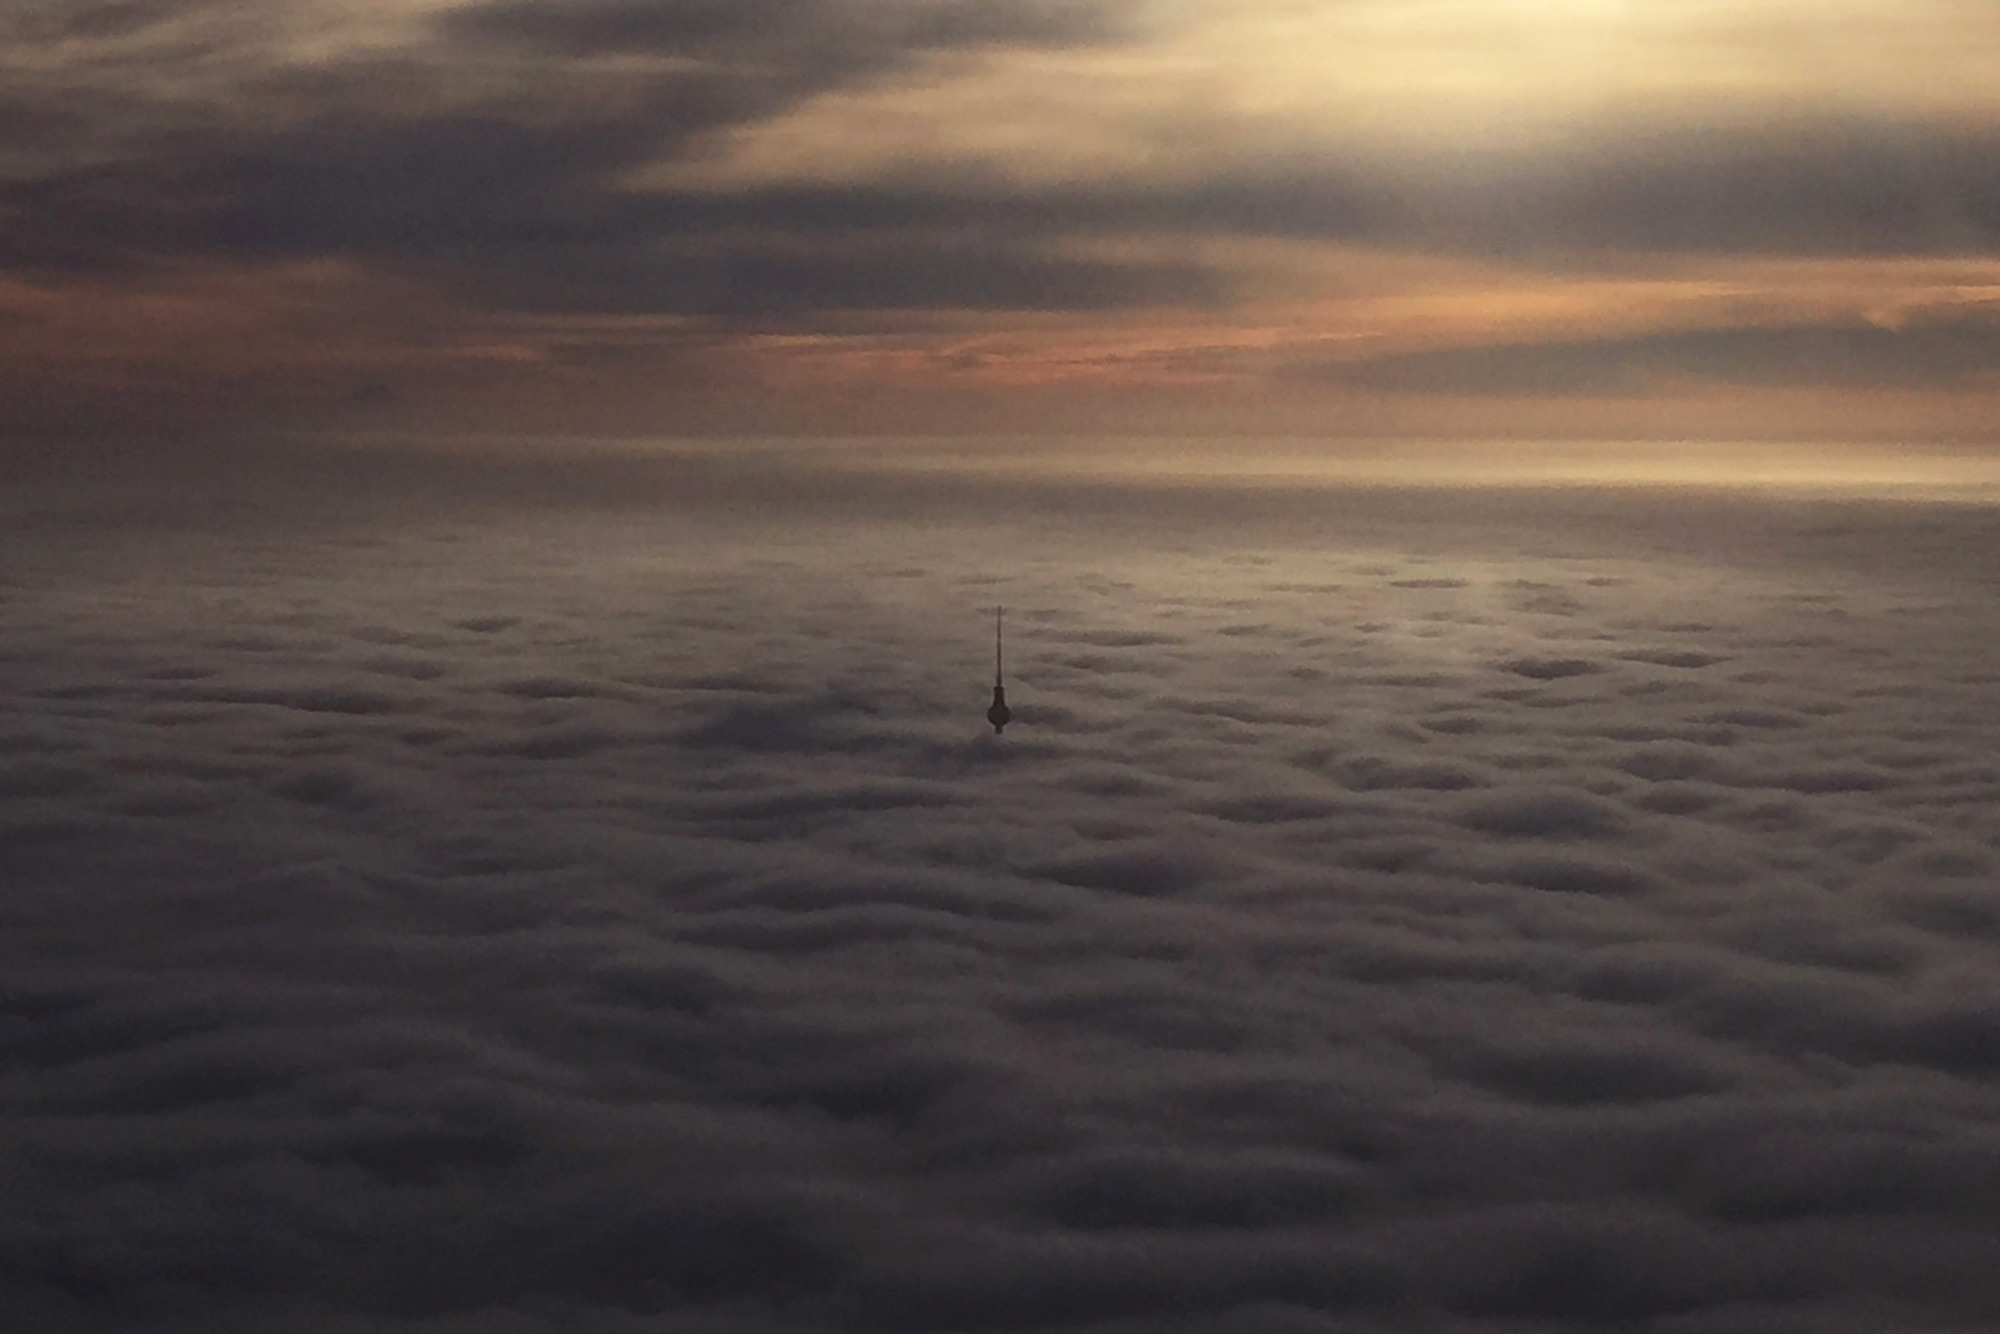 fernsehturm_ueber-den-wolken